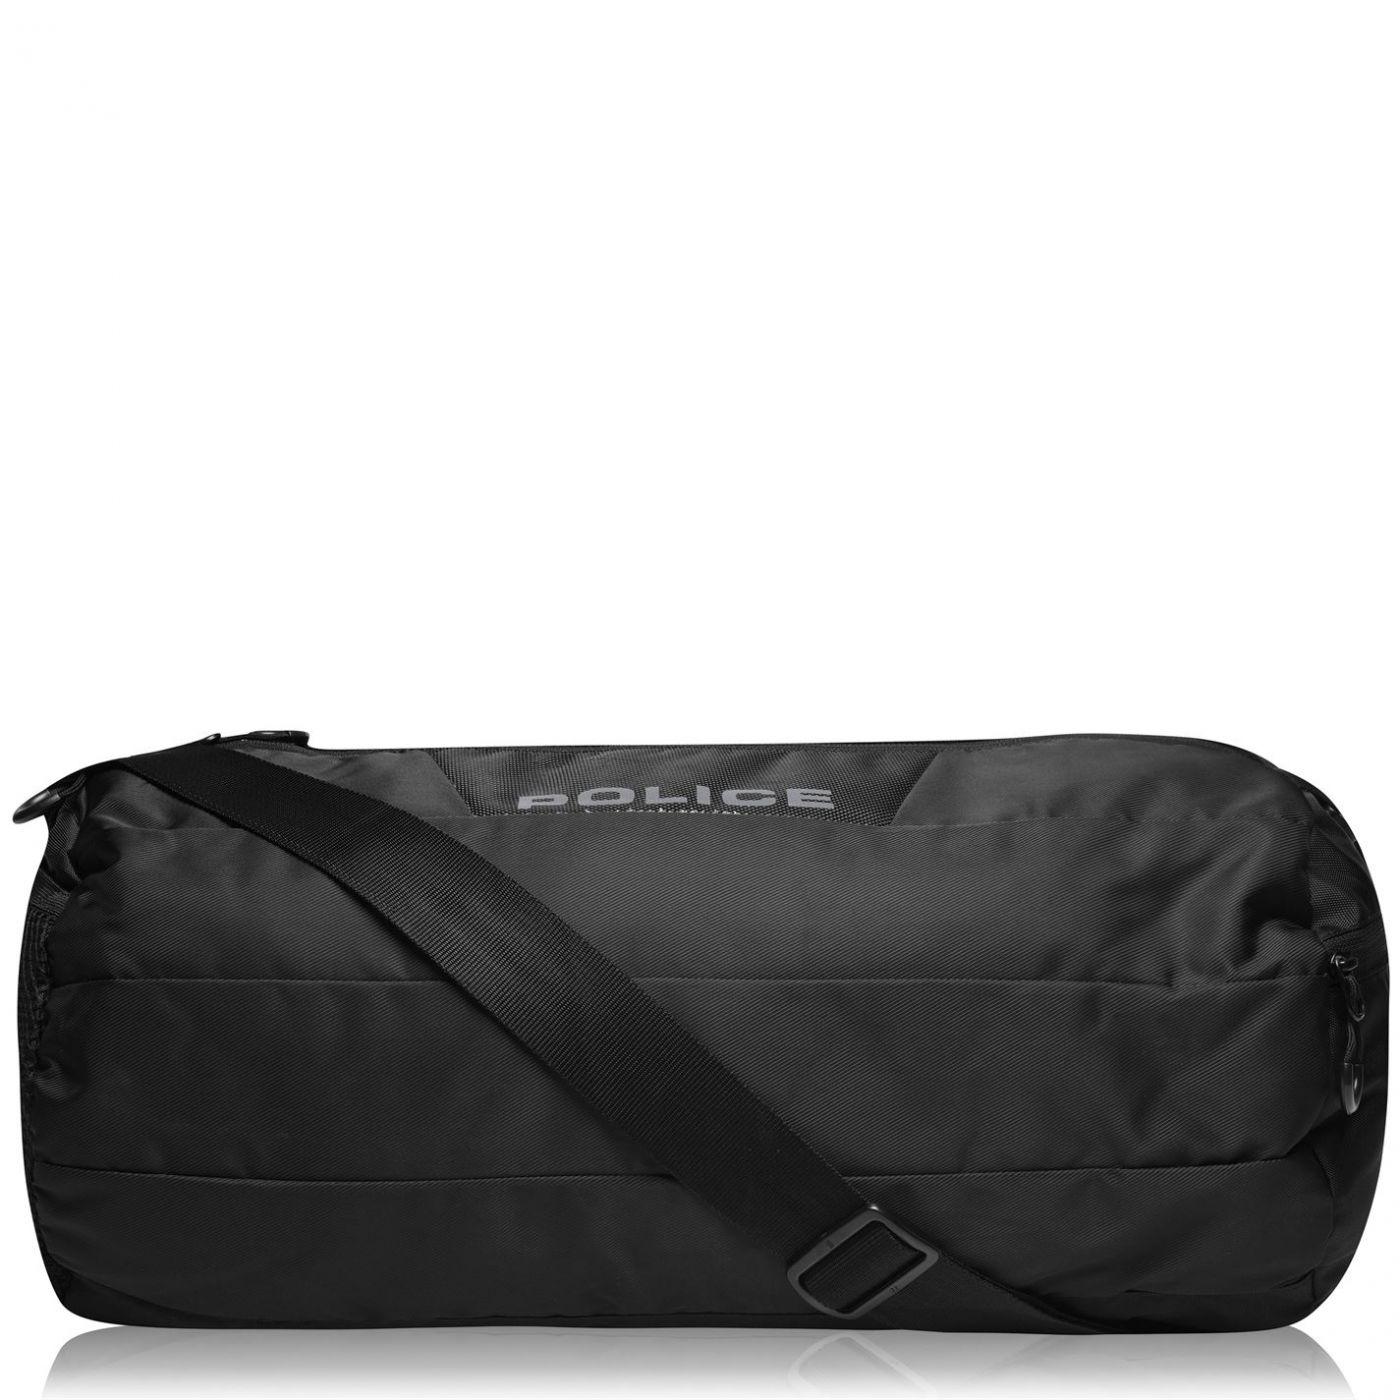 Police Duffle Bag 02 BX99